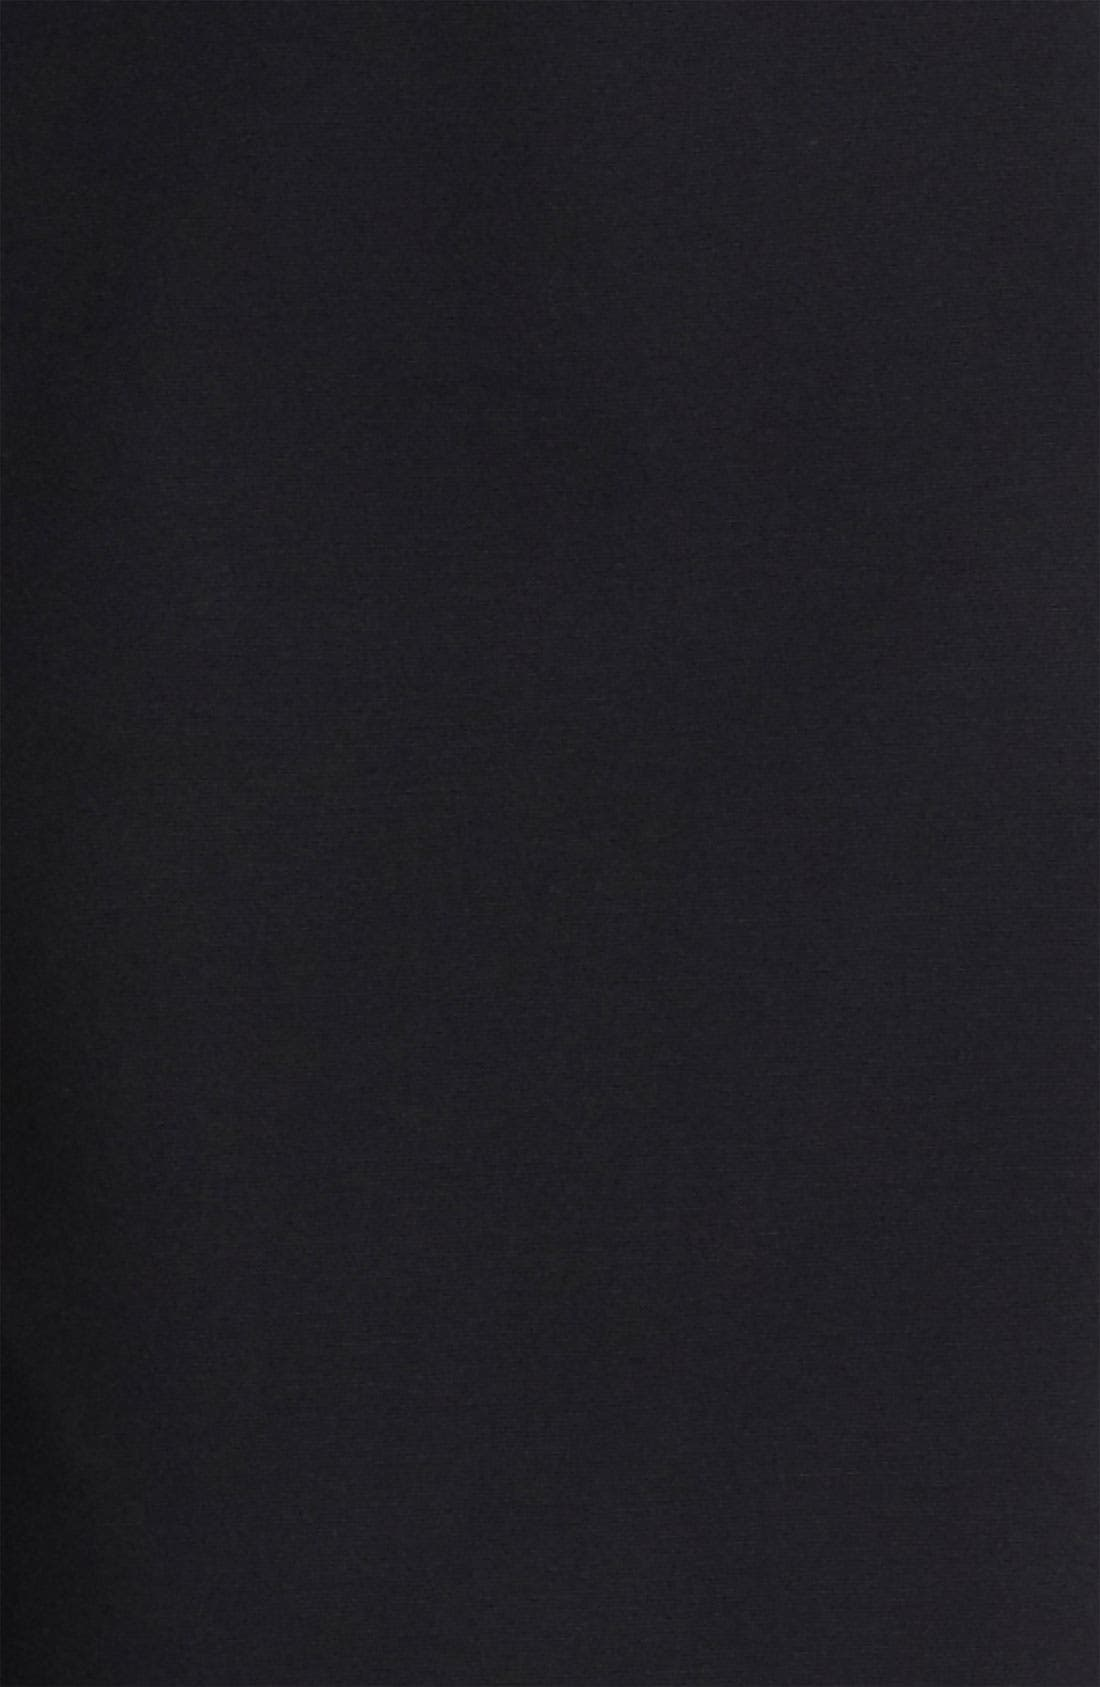 Alternate Image 3  - Emilio Pucci Crisscross Lace Punto Milano Dress